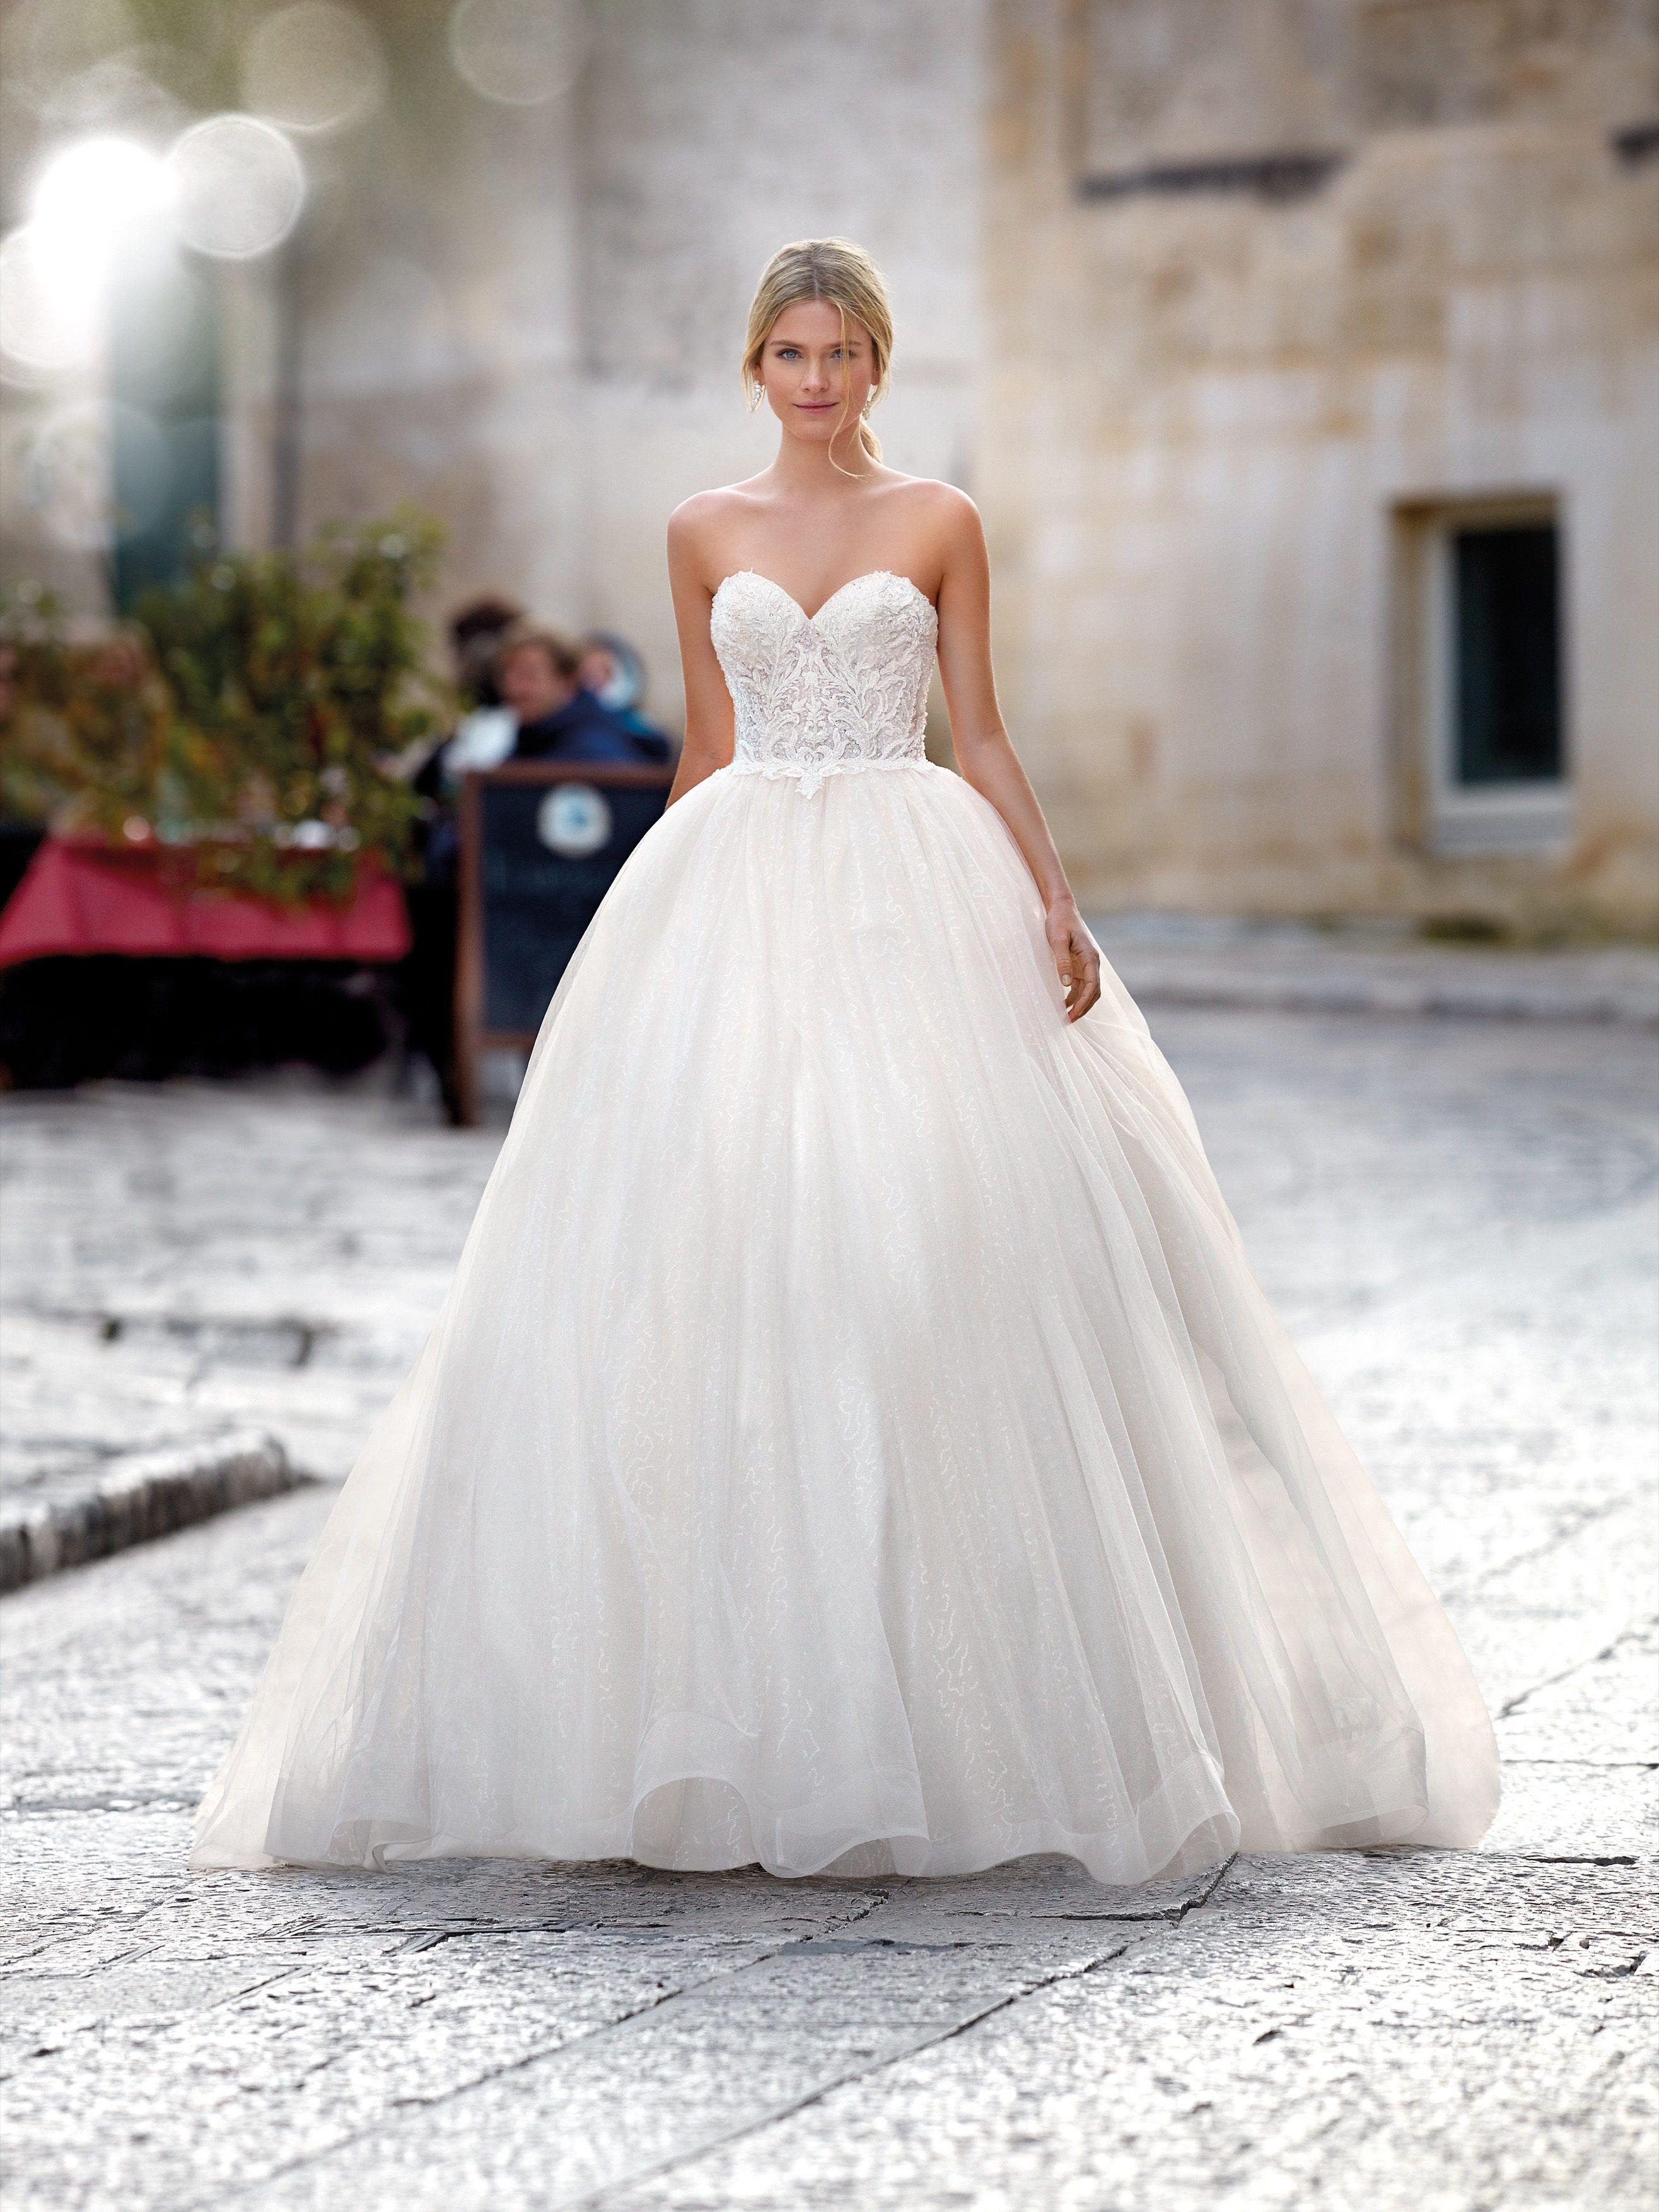 Princess Wedding Dress With Sweetheart Neckline Wedding Dresses Sweetheart Neckline Wedding Dresses Princess Wedding Dresses [ 3508 x 2631 Pixel ]